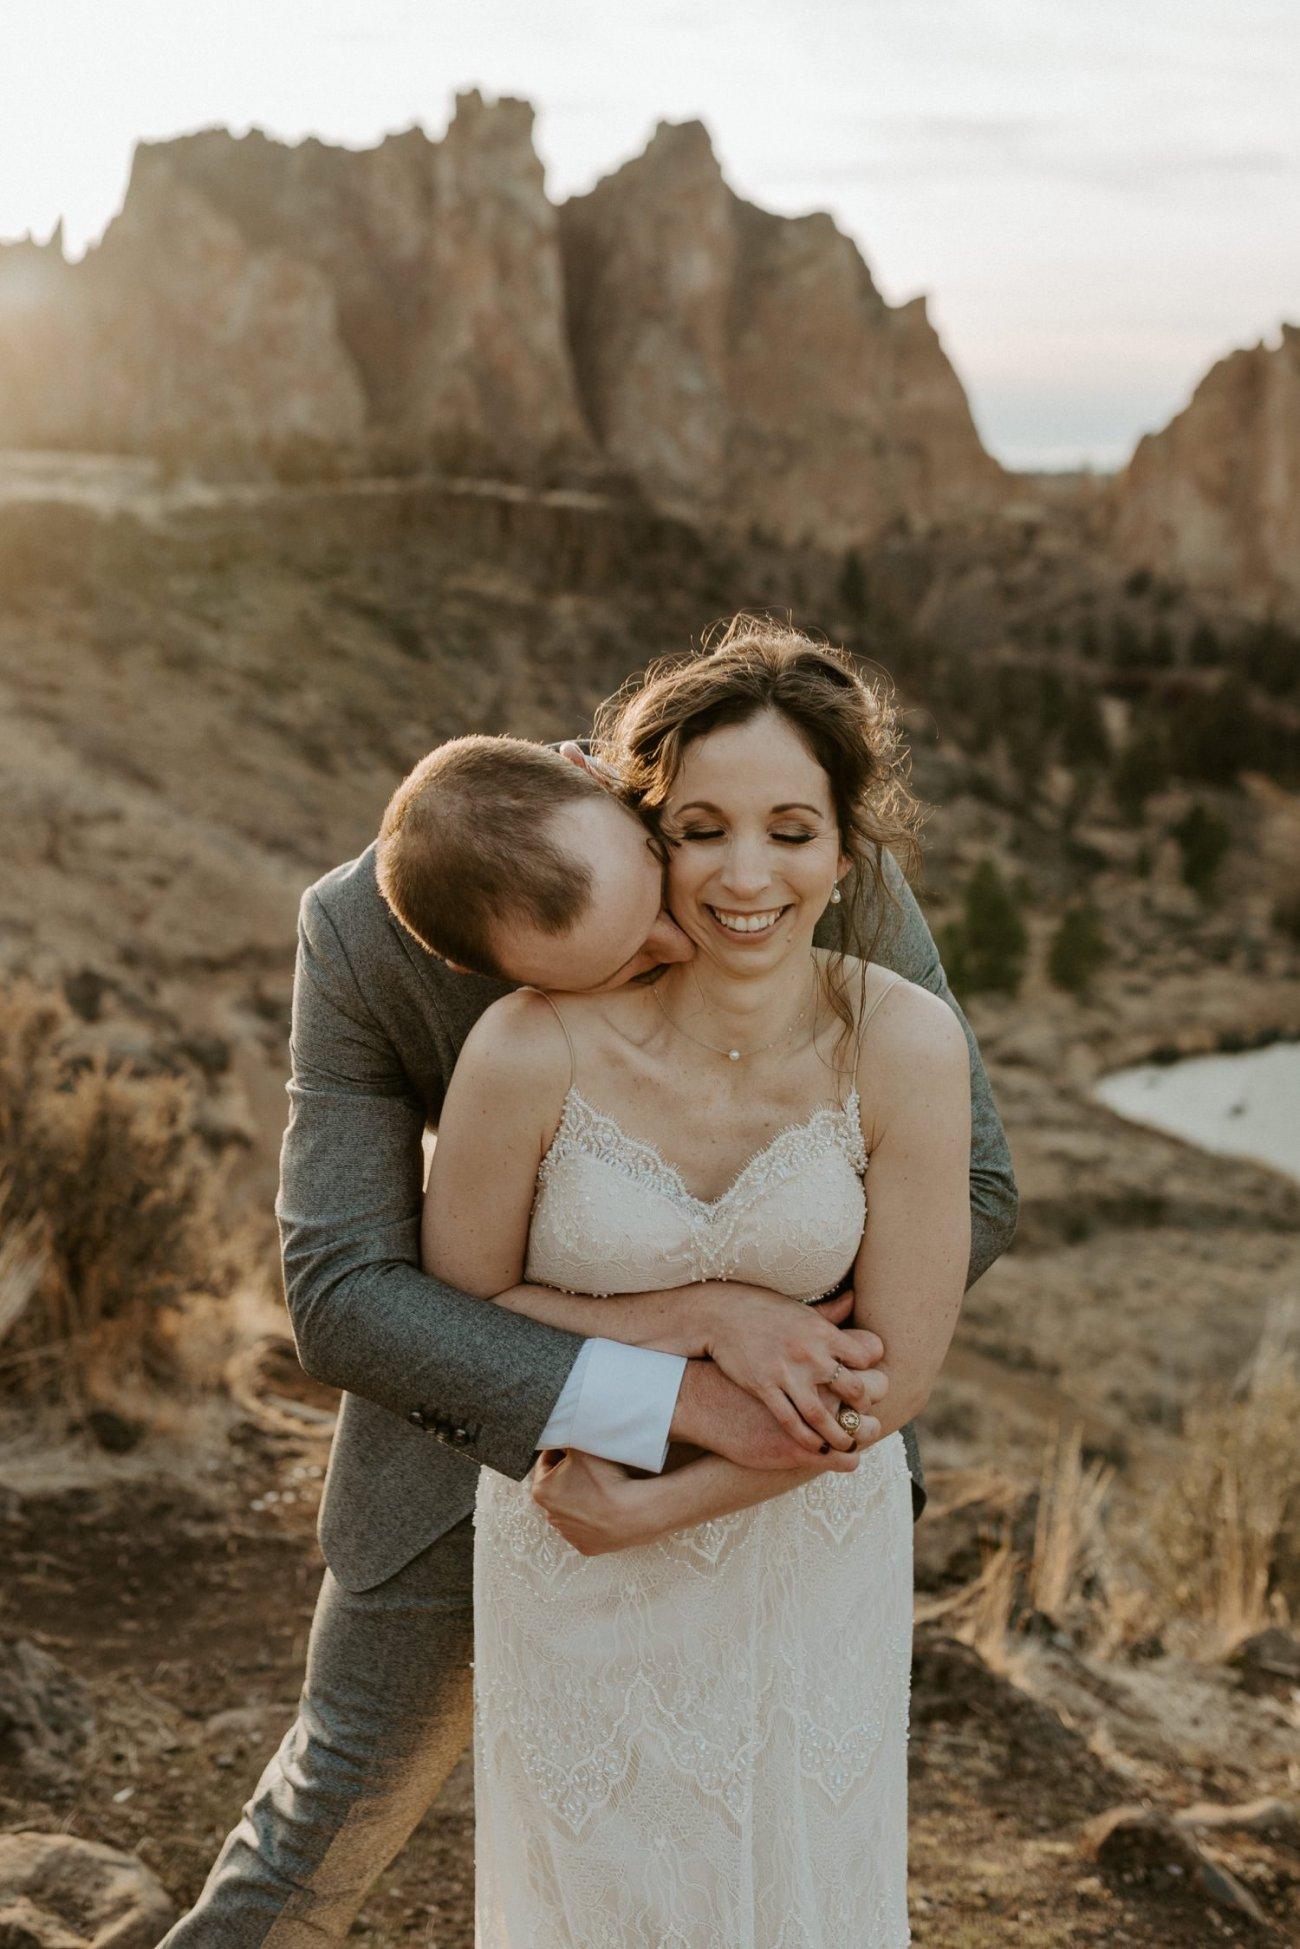 Smith Rock State Park Elopement Bend Oregon Elopement Photographer Anais Possamai Photography 014